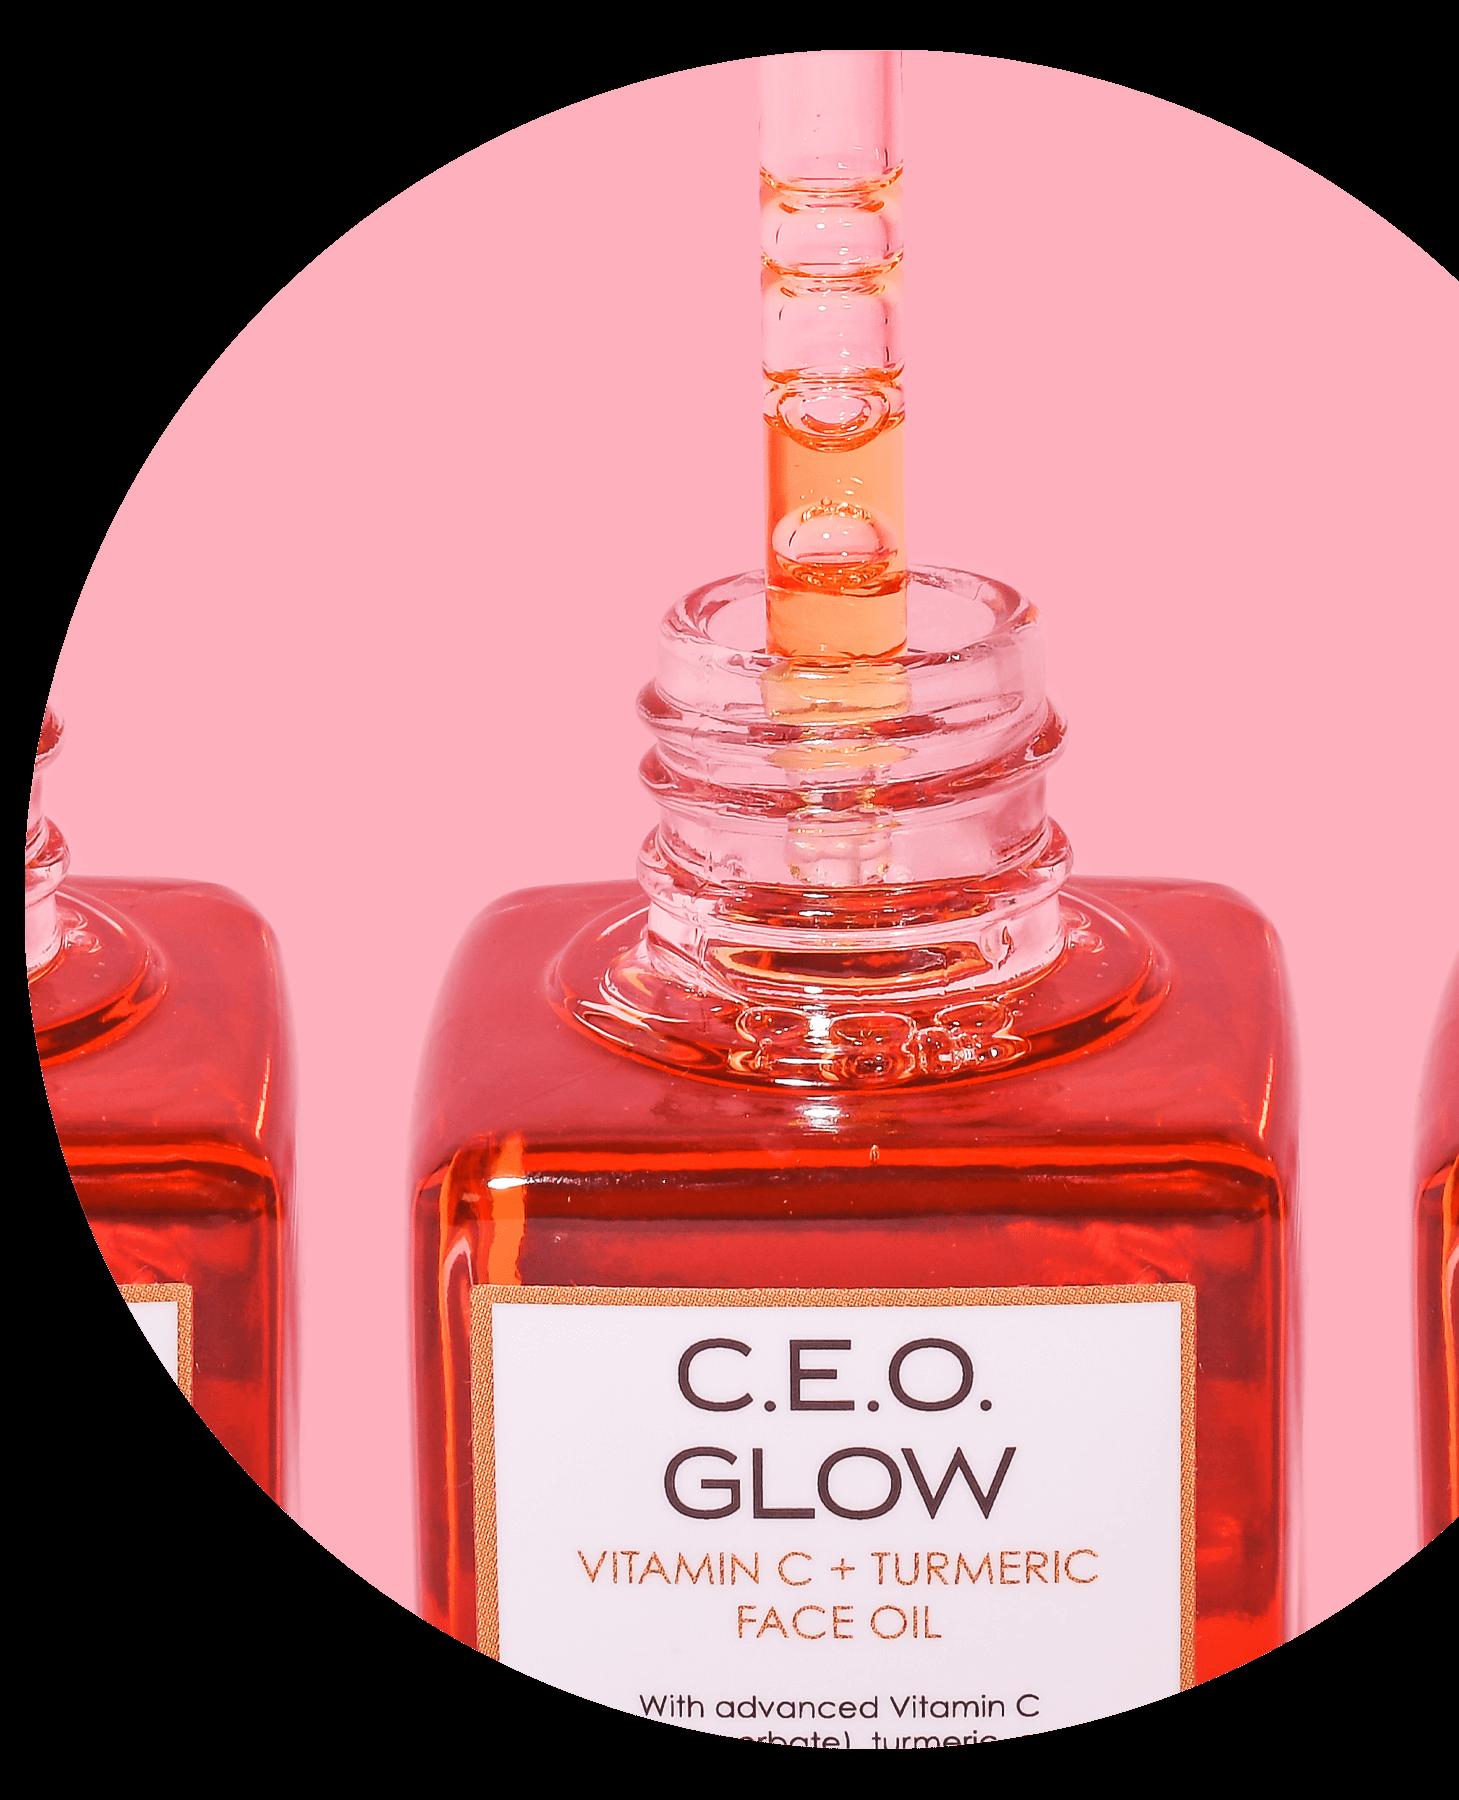 Instantly Illuminate with C.E.O.!